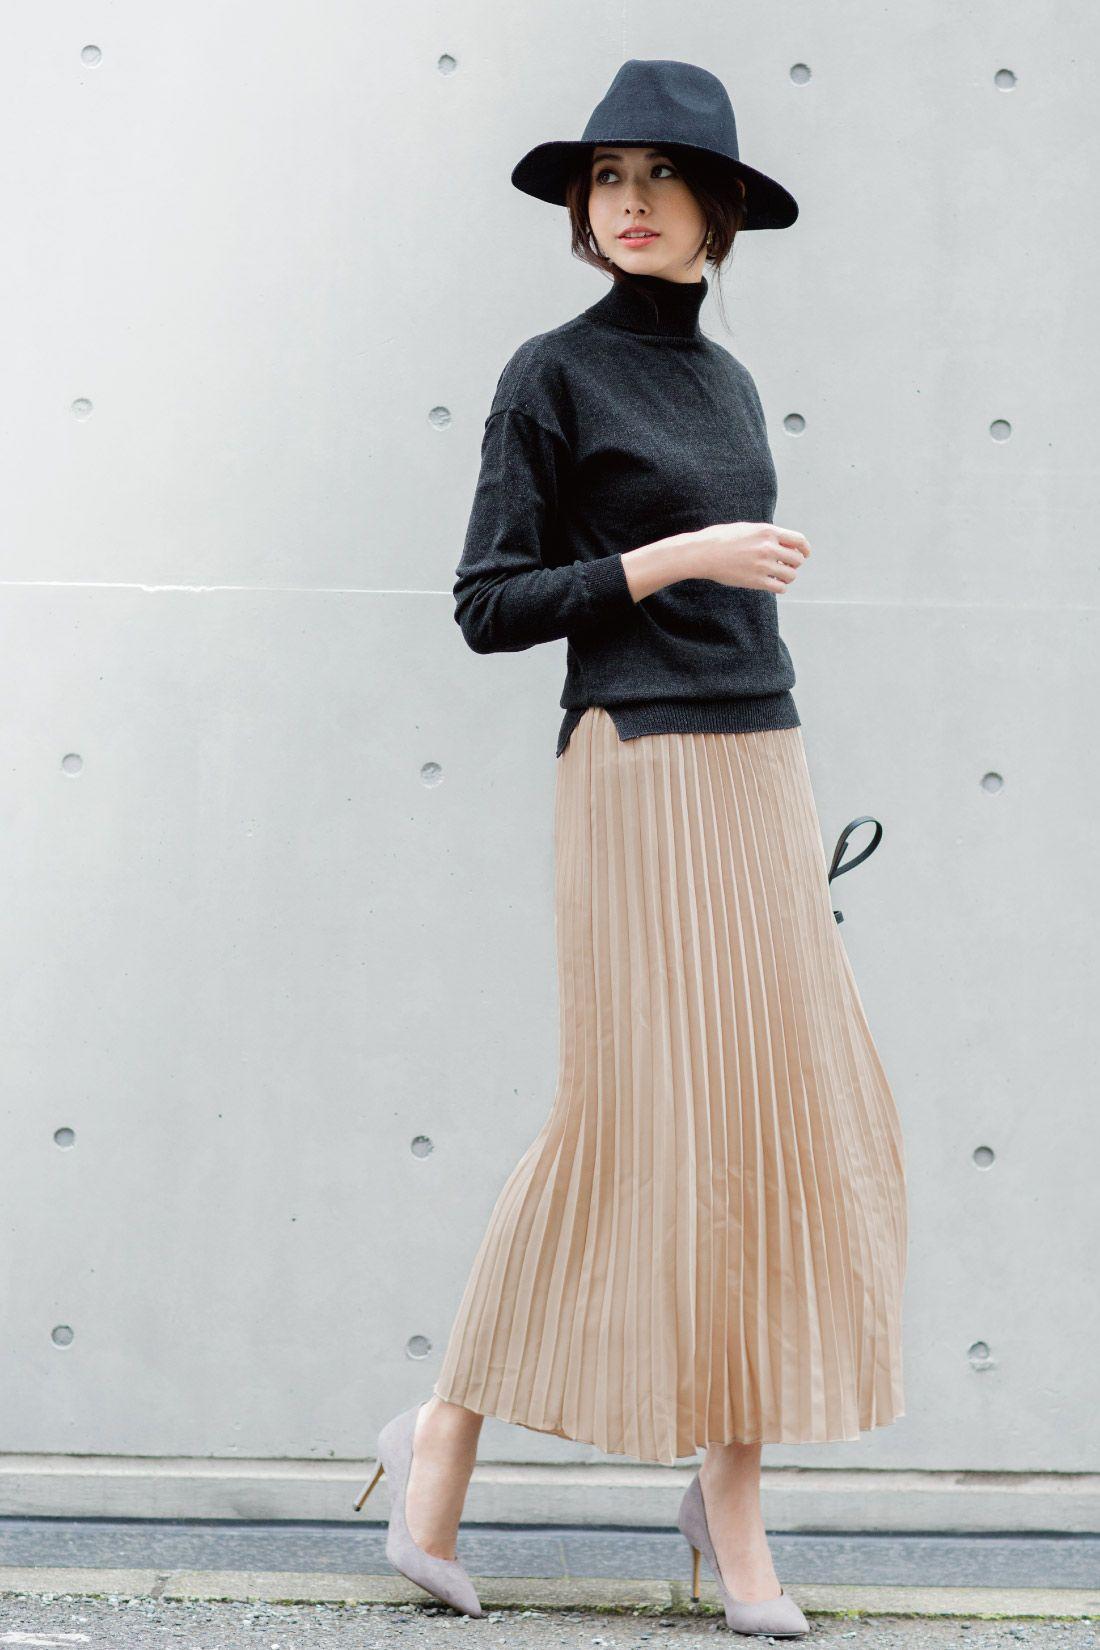 iedit 一枚でスタイル完成 プリーツが女らしいロングドッキングワンピース ダークグレー ピンクベージュ フェリシモ ファッションスタイル ファッション ファッション レディース